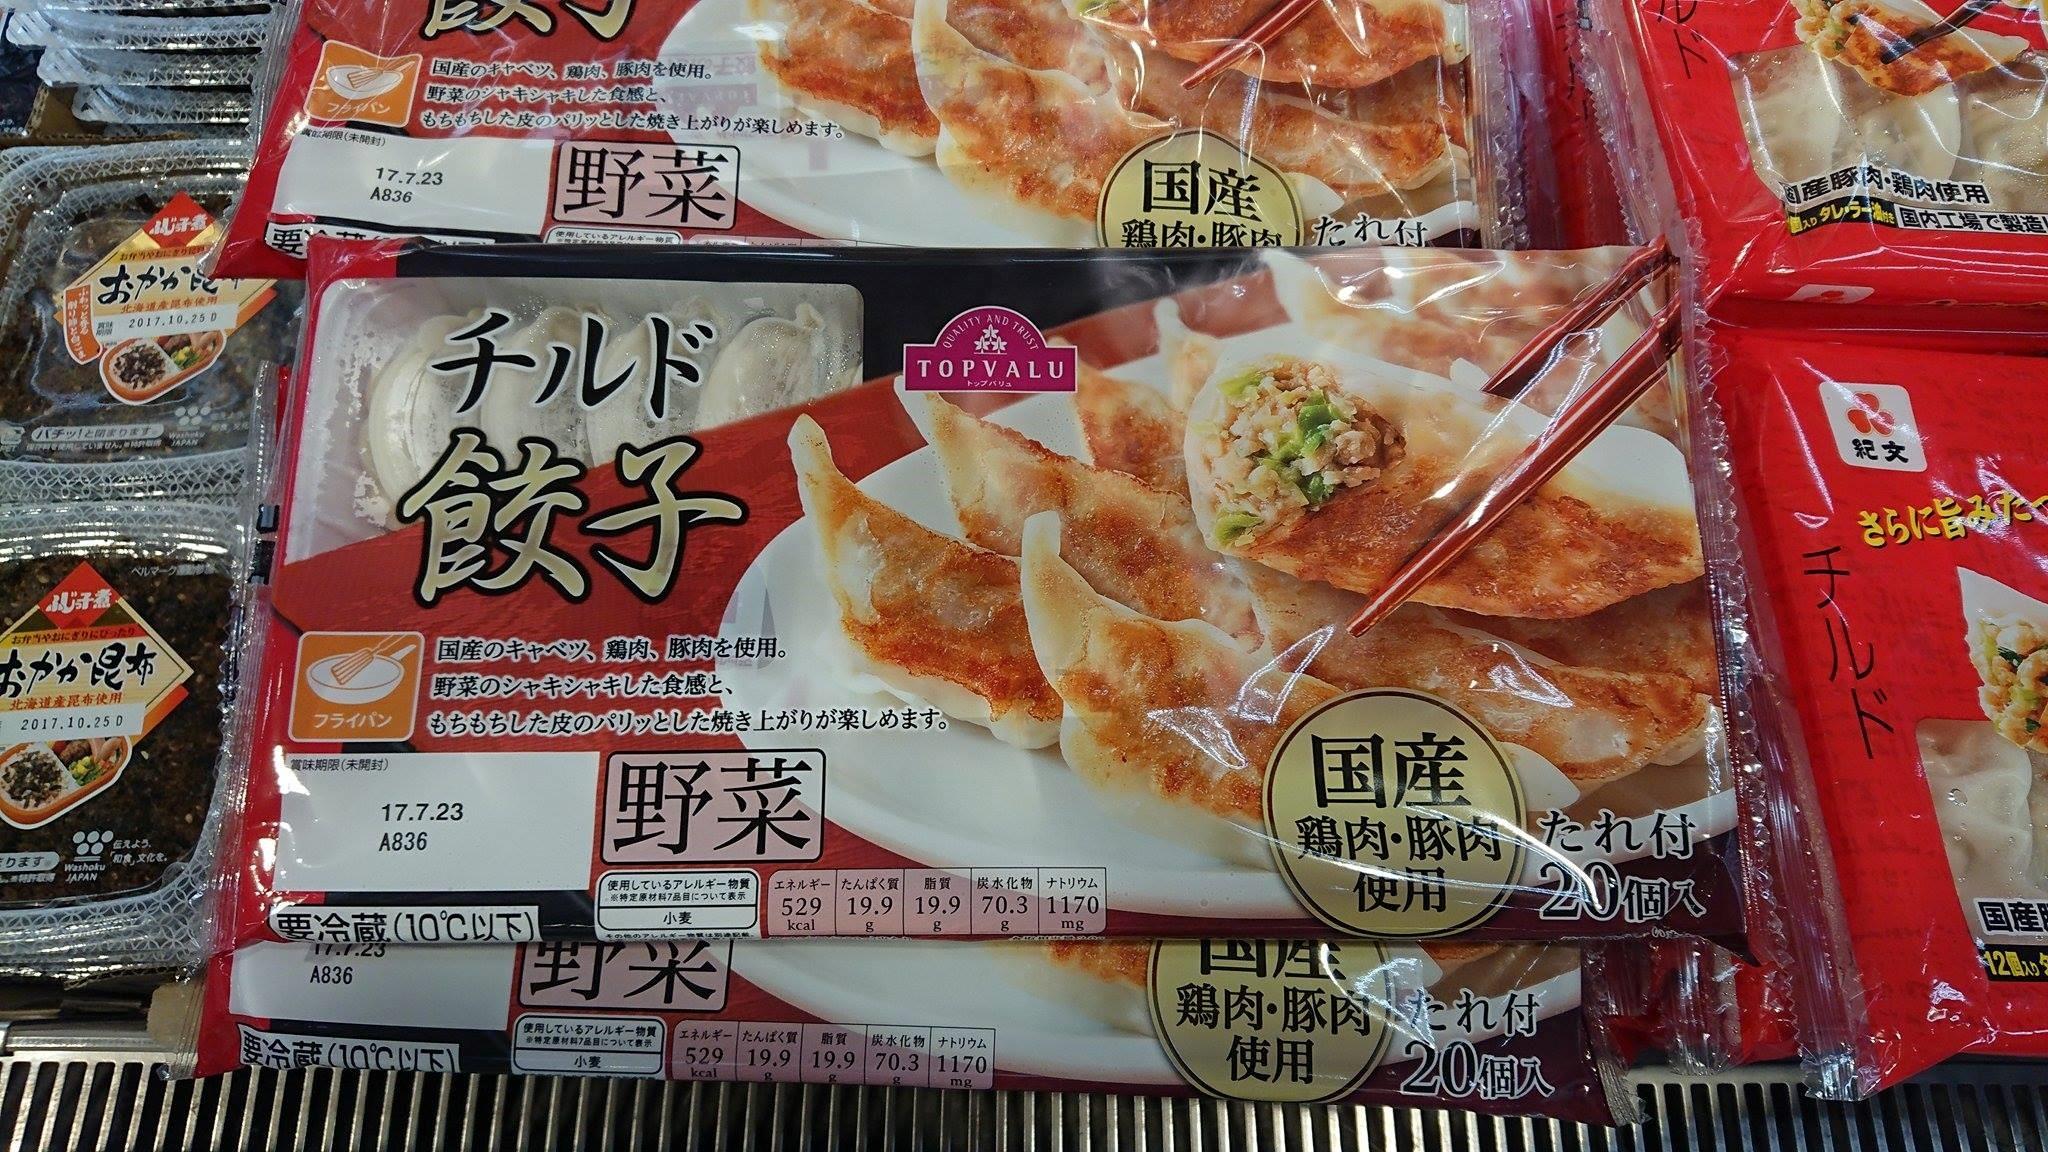 Gyoza ở siêu thị Aeon